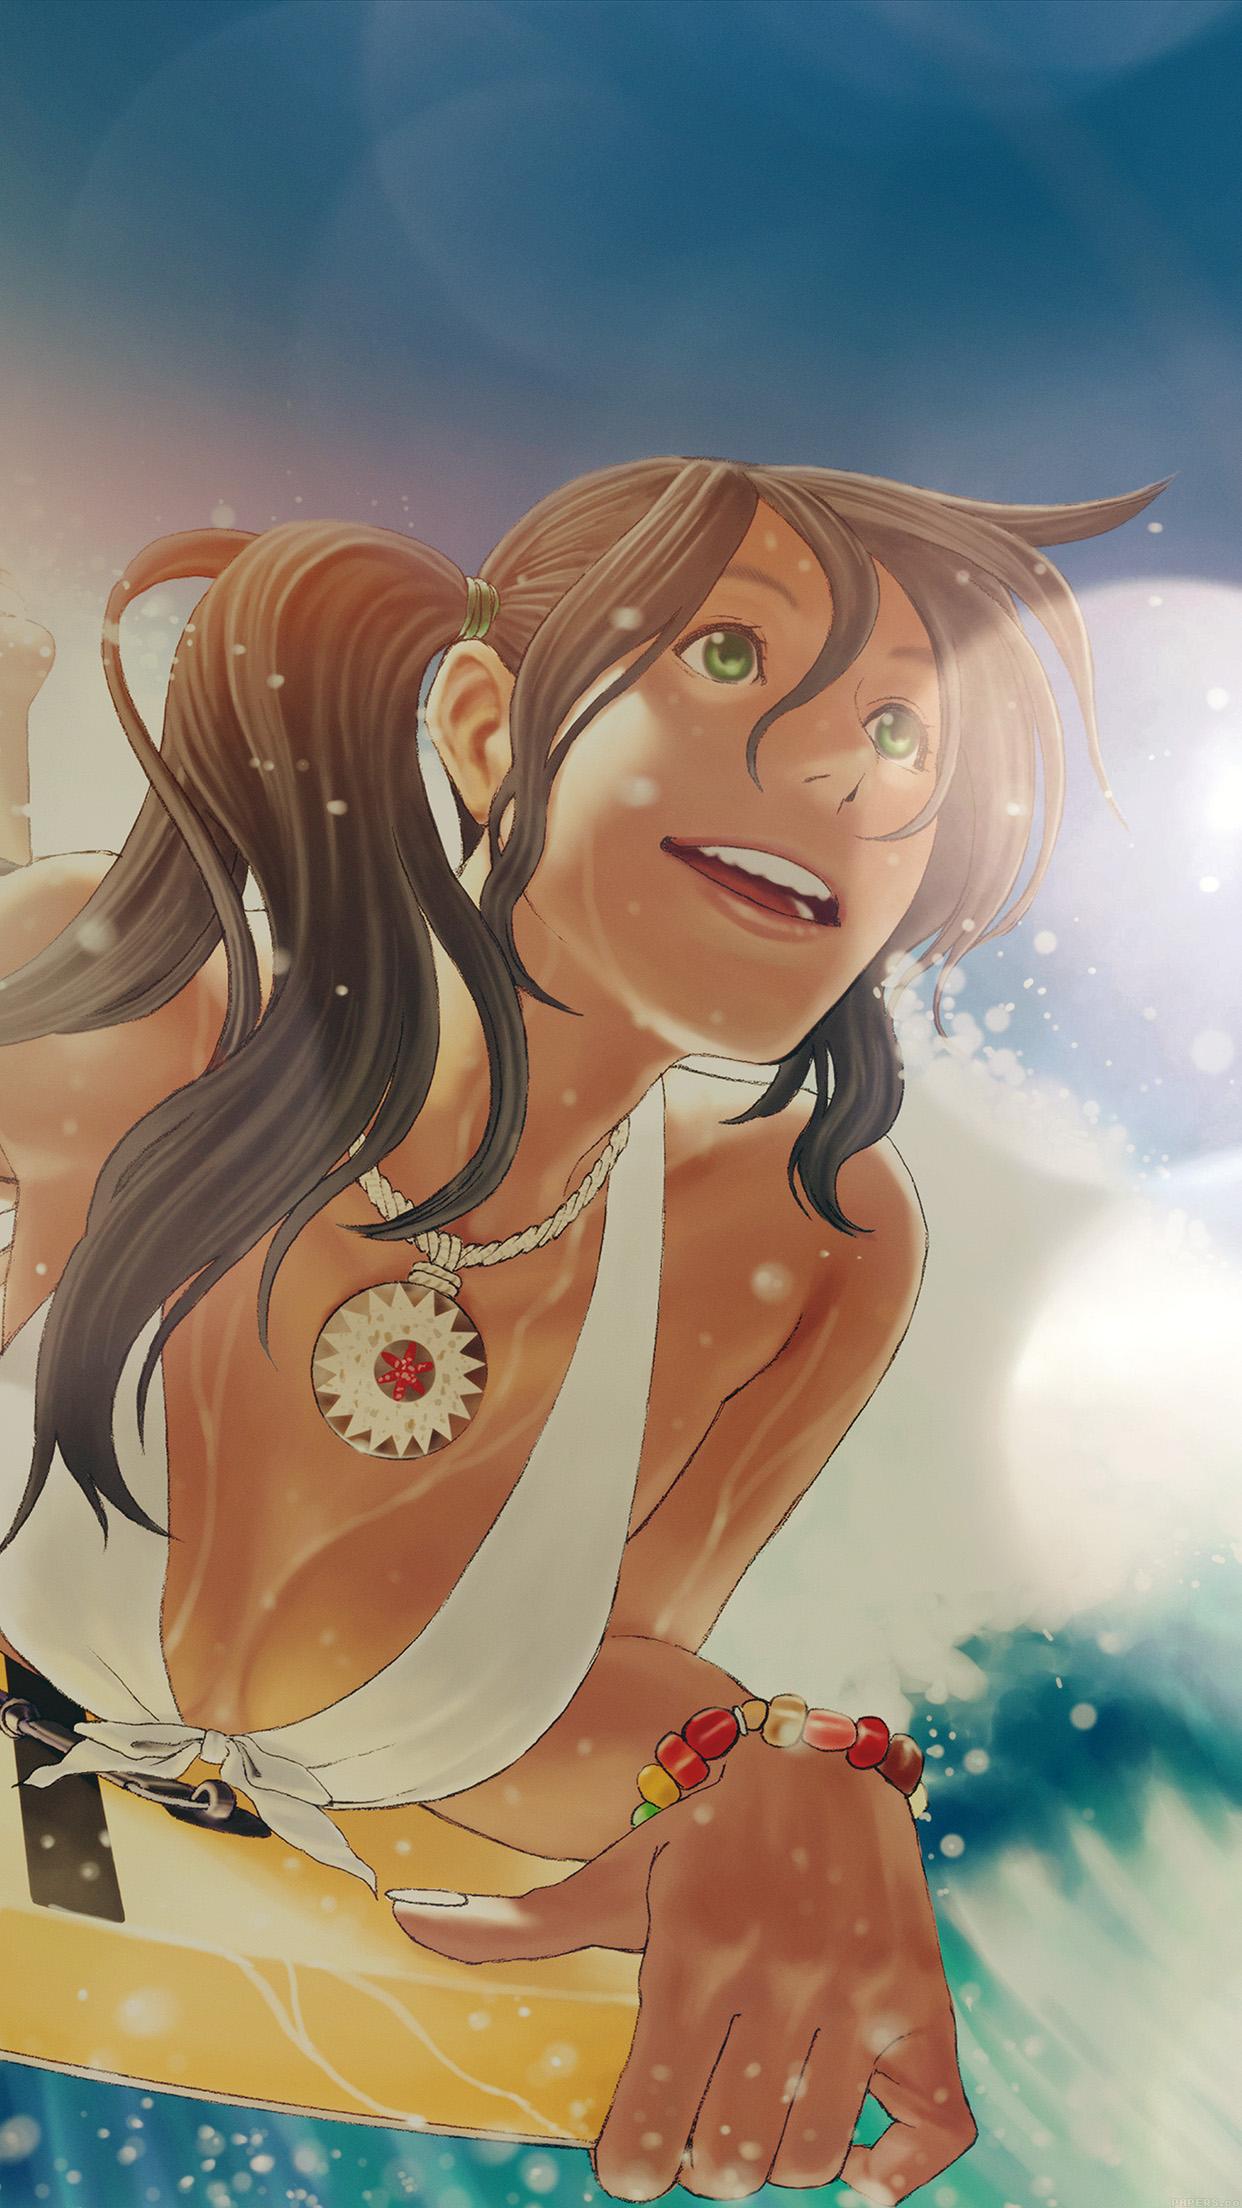 Surf Wallpaper Iphone X Aj87 Surfing Girl Anime Flare Illust Art Sea Sports